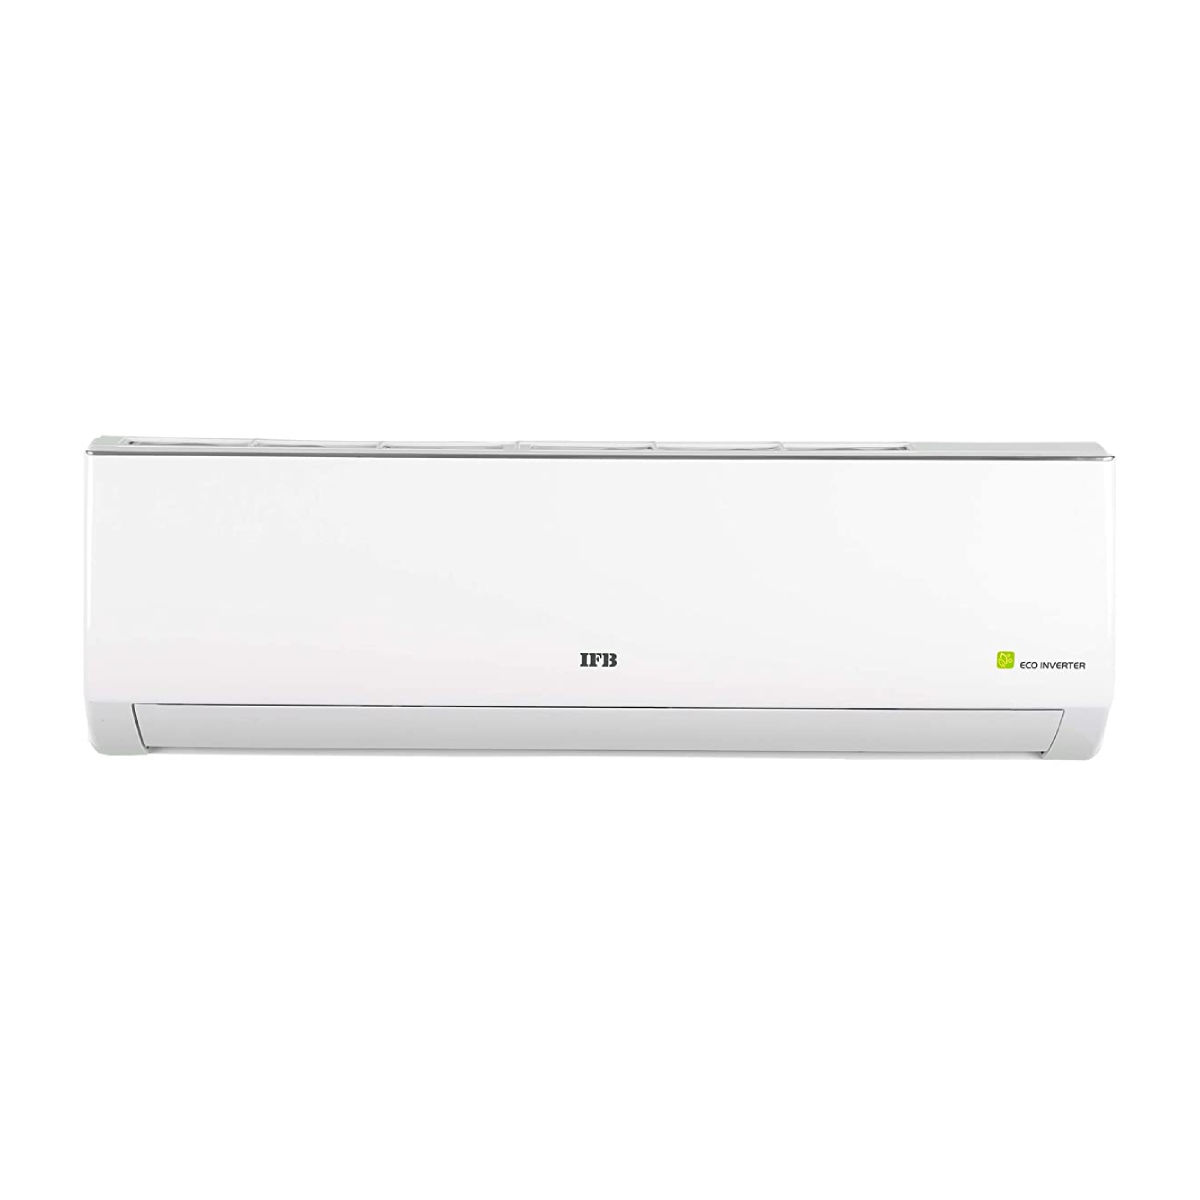 आई.एफ.बी. IACI12X83T3C 1 Ton 3 Star Split Air Conditioner